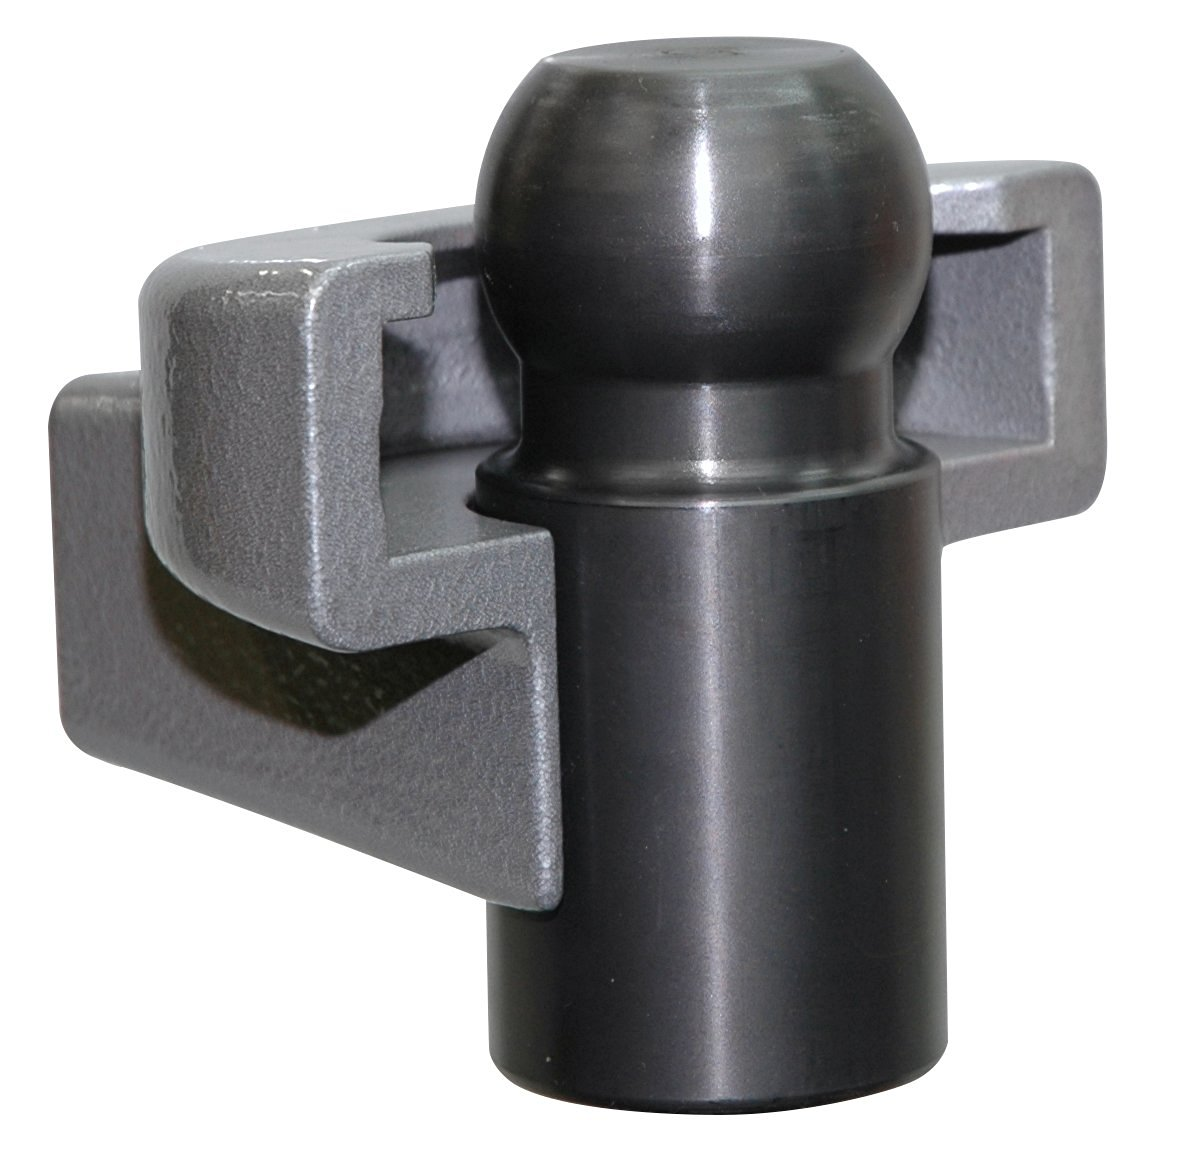 AMPLOCK U-BRG2516 Airstream RV coupler lock/trailer coupler lock (fits 2 5/16 inches coupler)